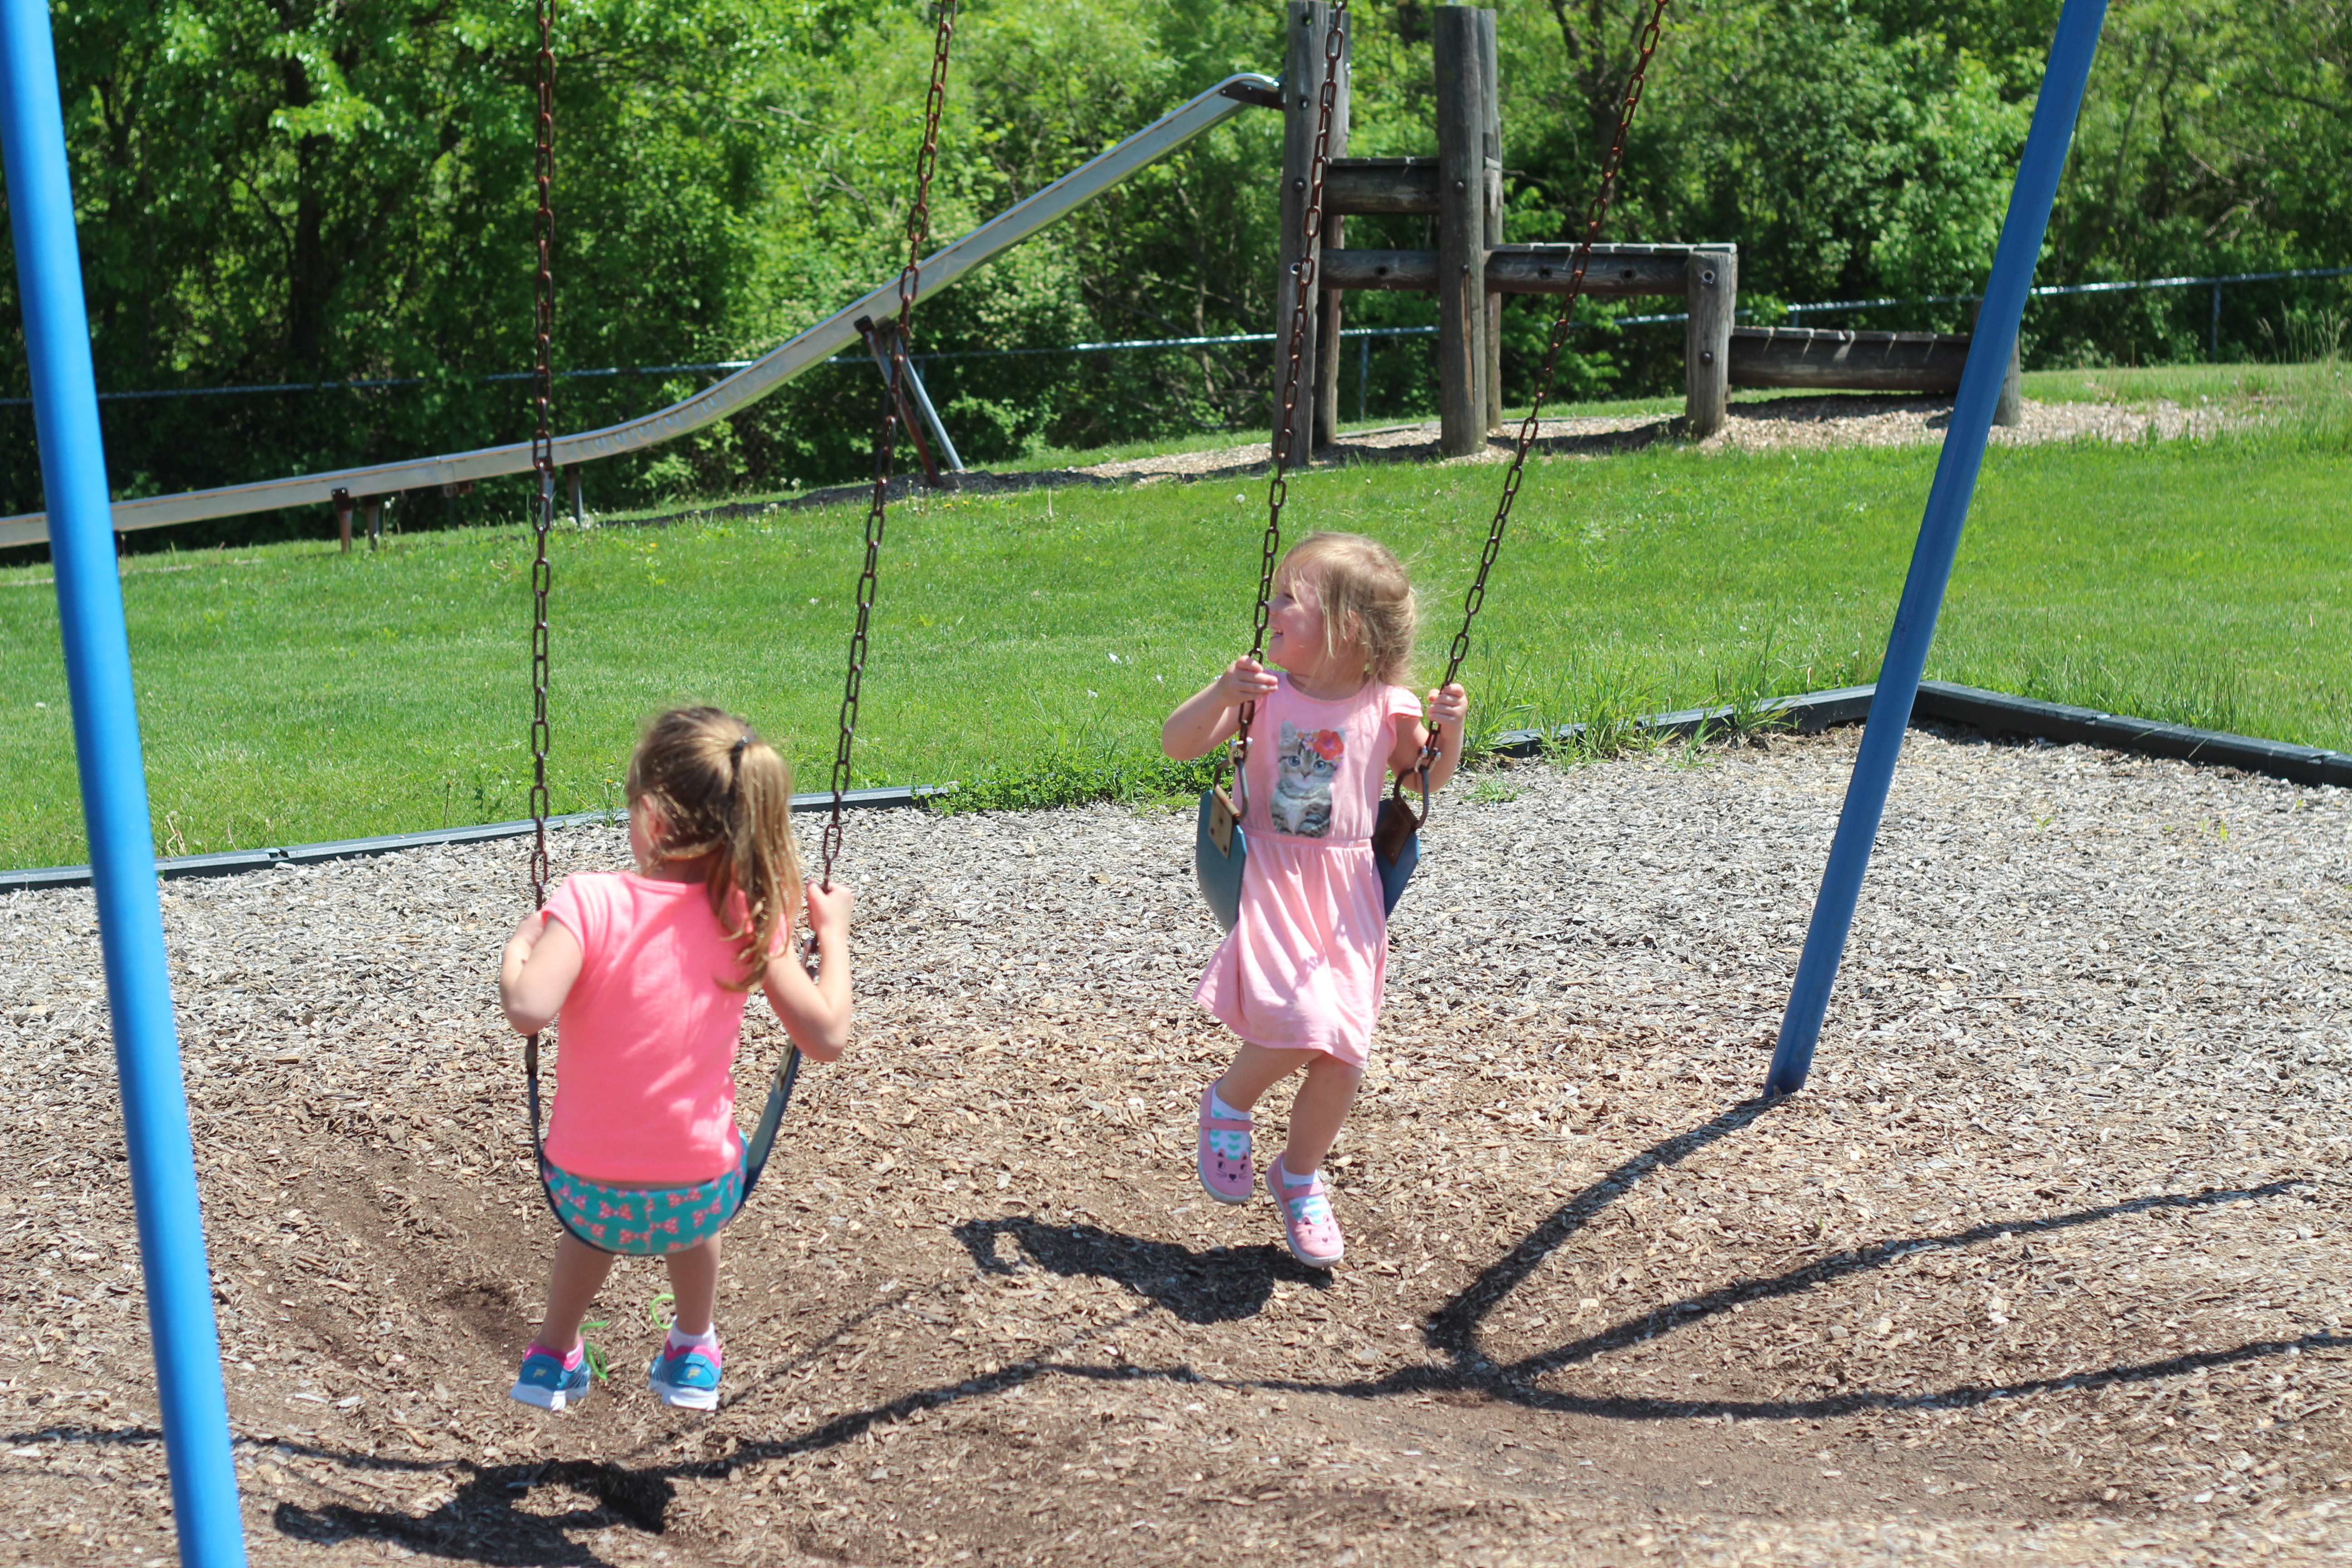 Two girls swing